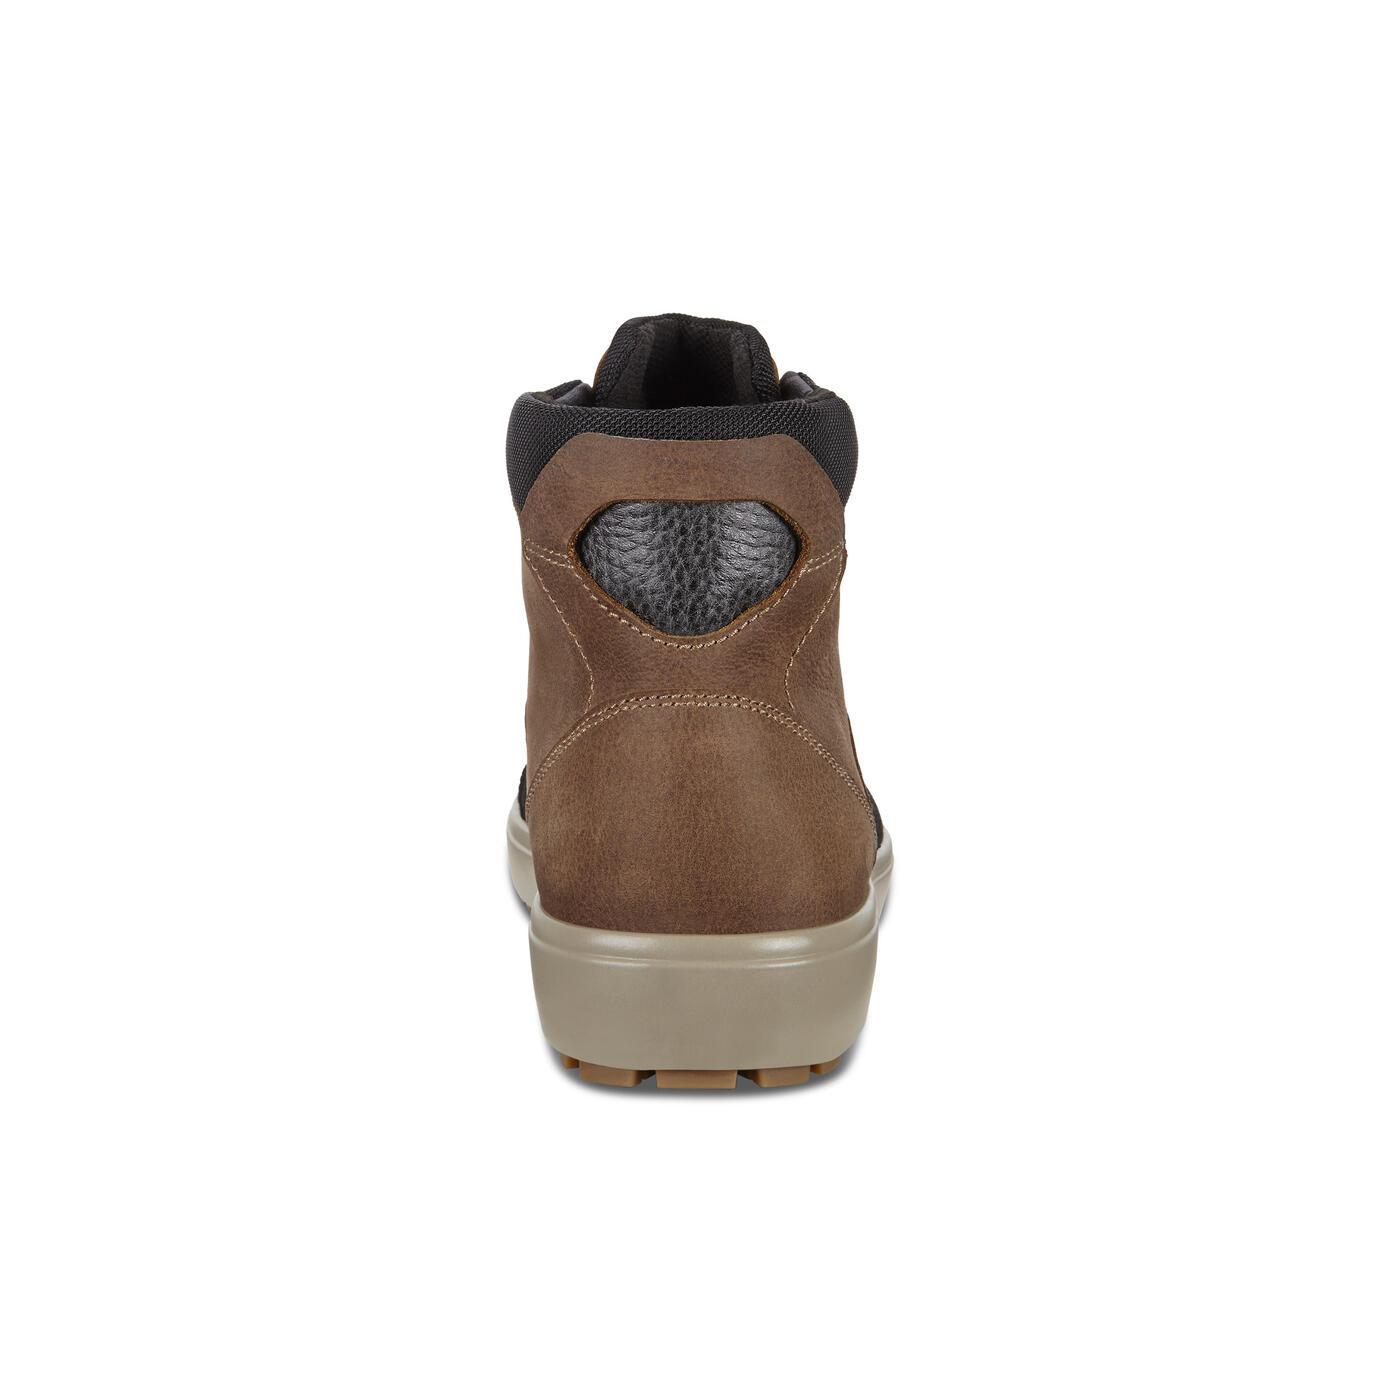 Botte sneaker ECCO Soft 7 Tred GTX pour hommes